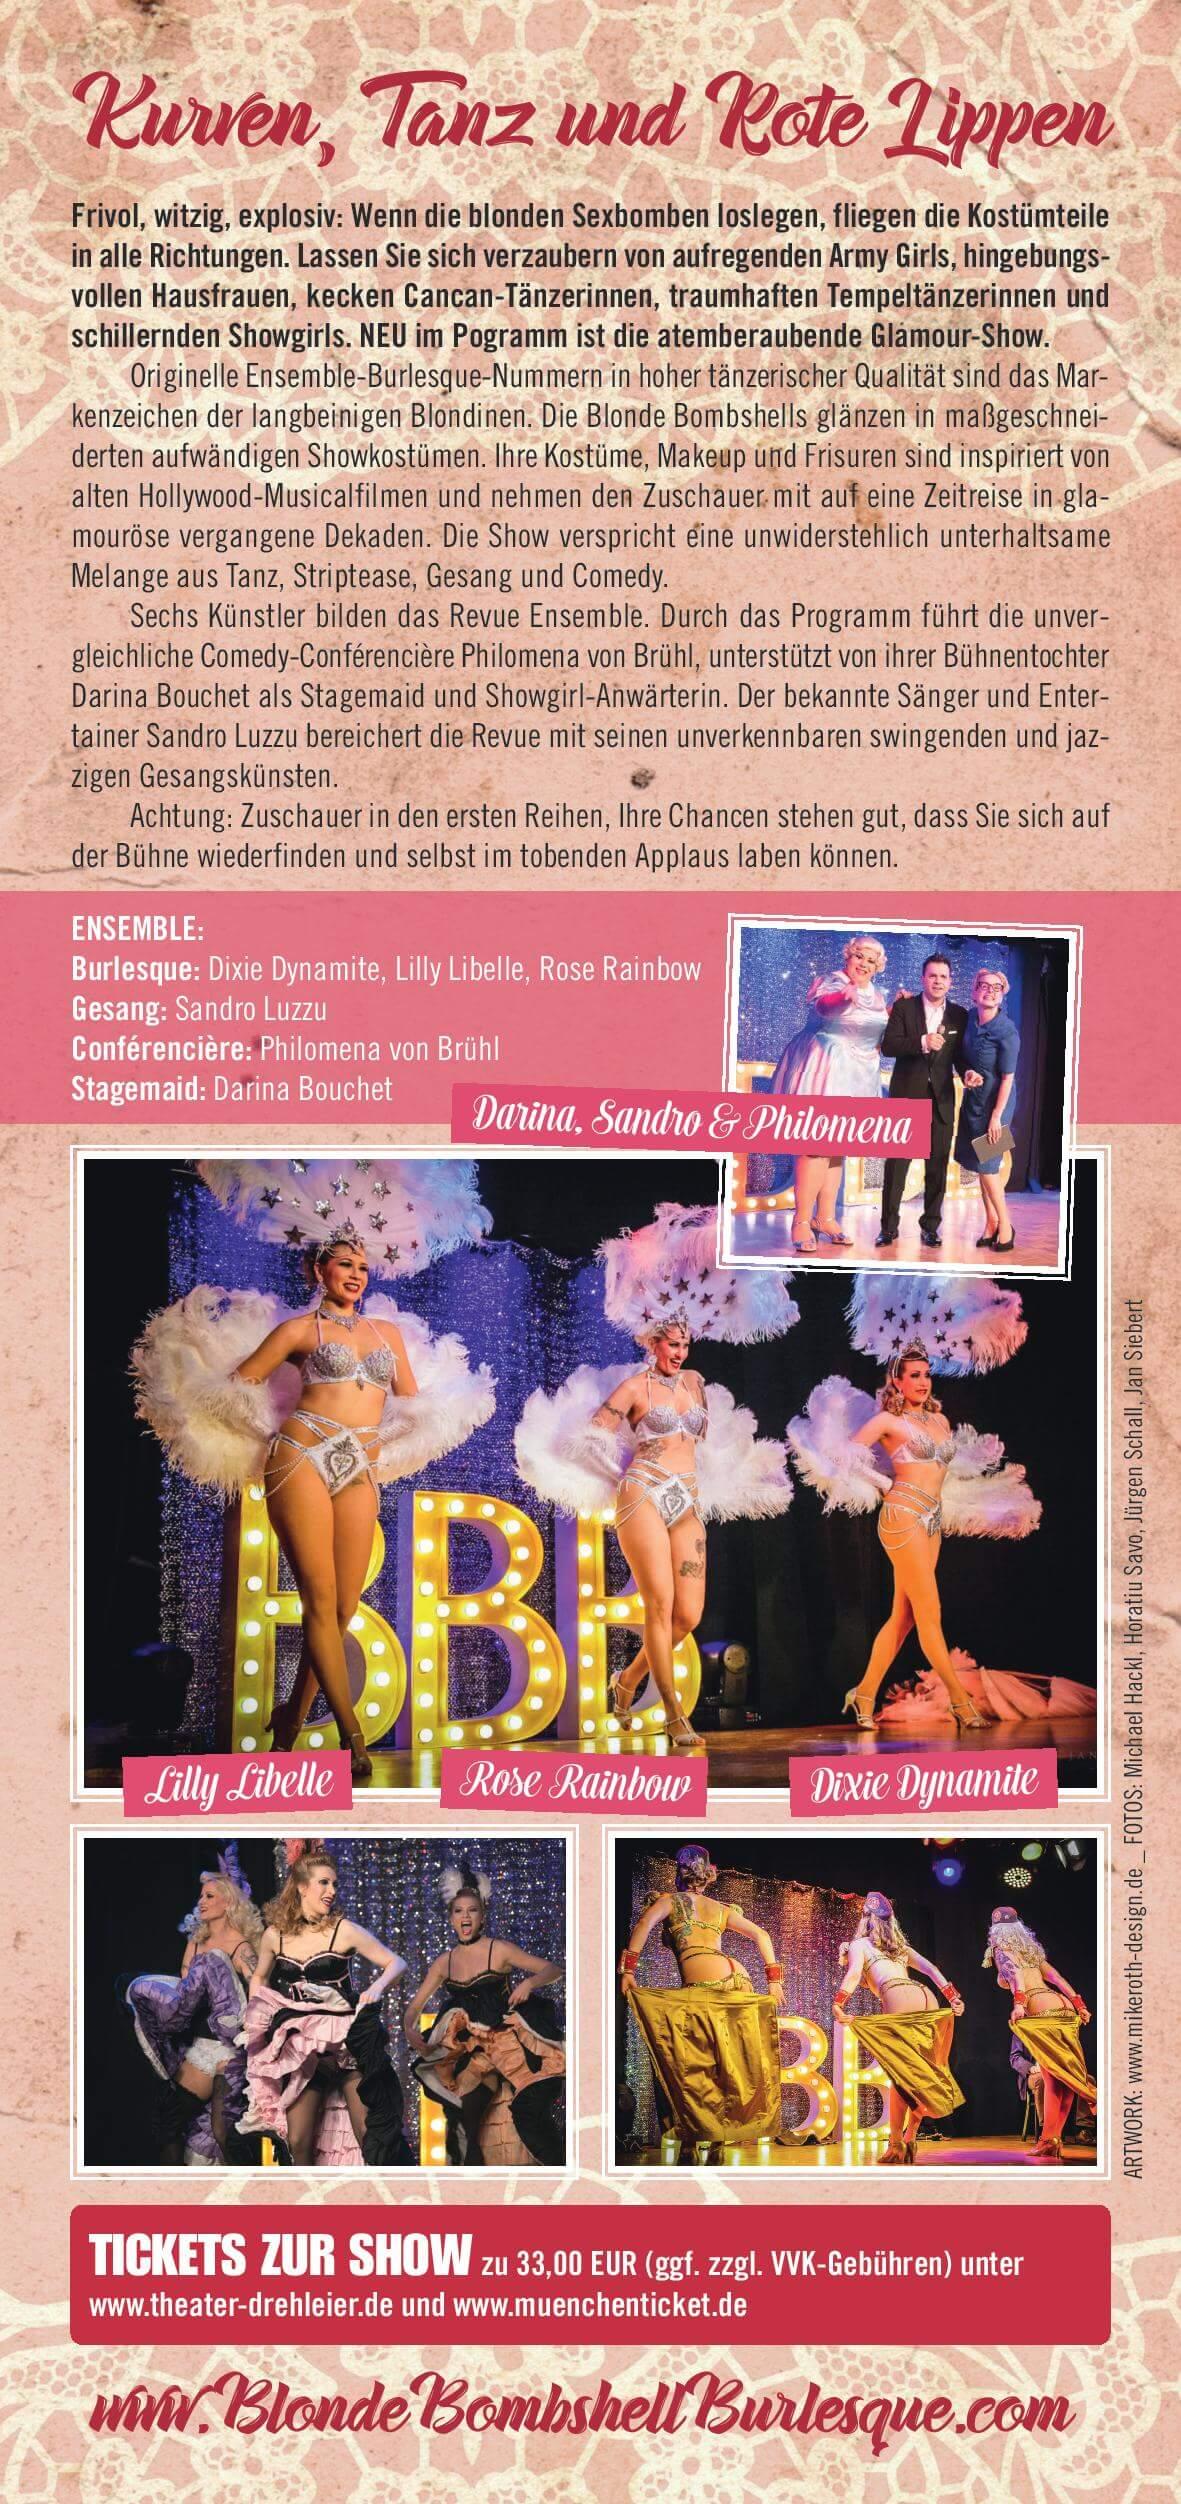 Blonde Bombshell Burlesque Flyer Kurven, Tanz und rote Lippen